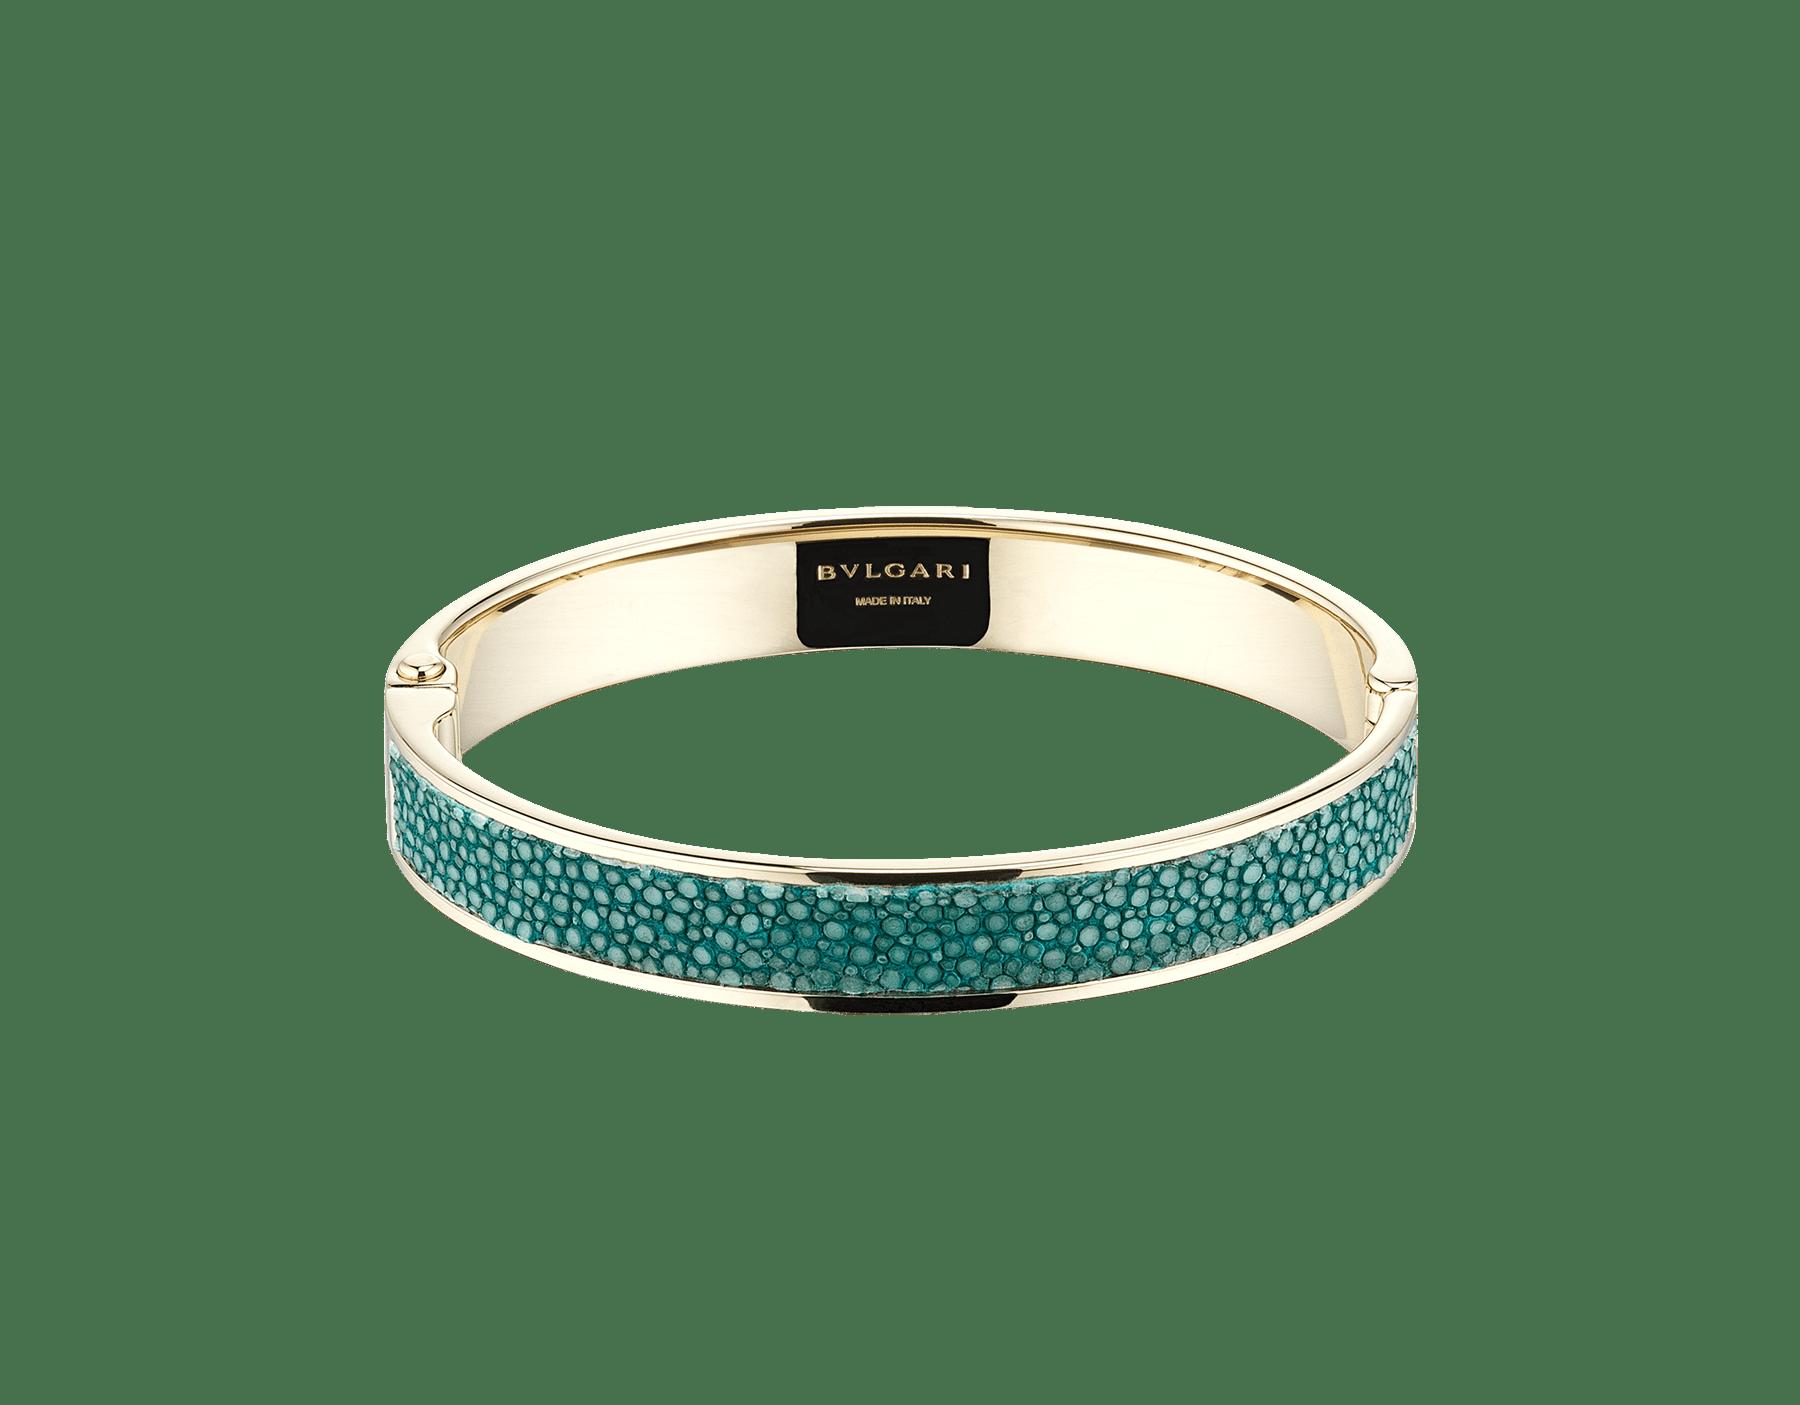 "New ""BVLGARI BVLGARI"" light gold bangle with an emerald-green galuchat skin insert and hinge bearing the BVLGARI logo. Engraved logo on the inside. HINGEBBBRACLT-G-EG image 3"